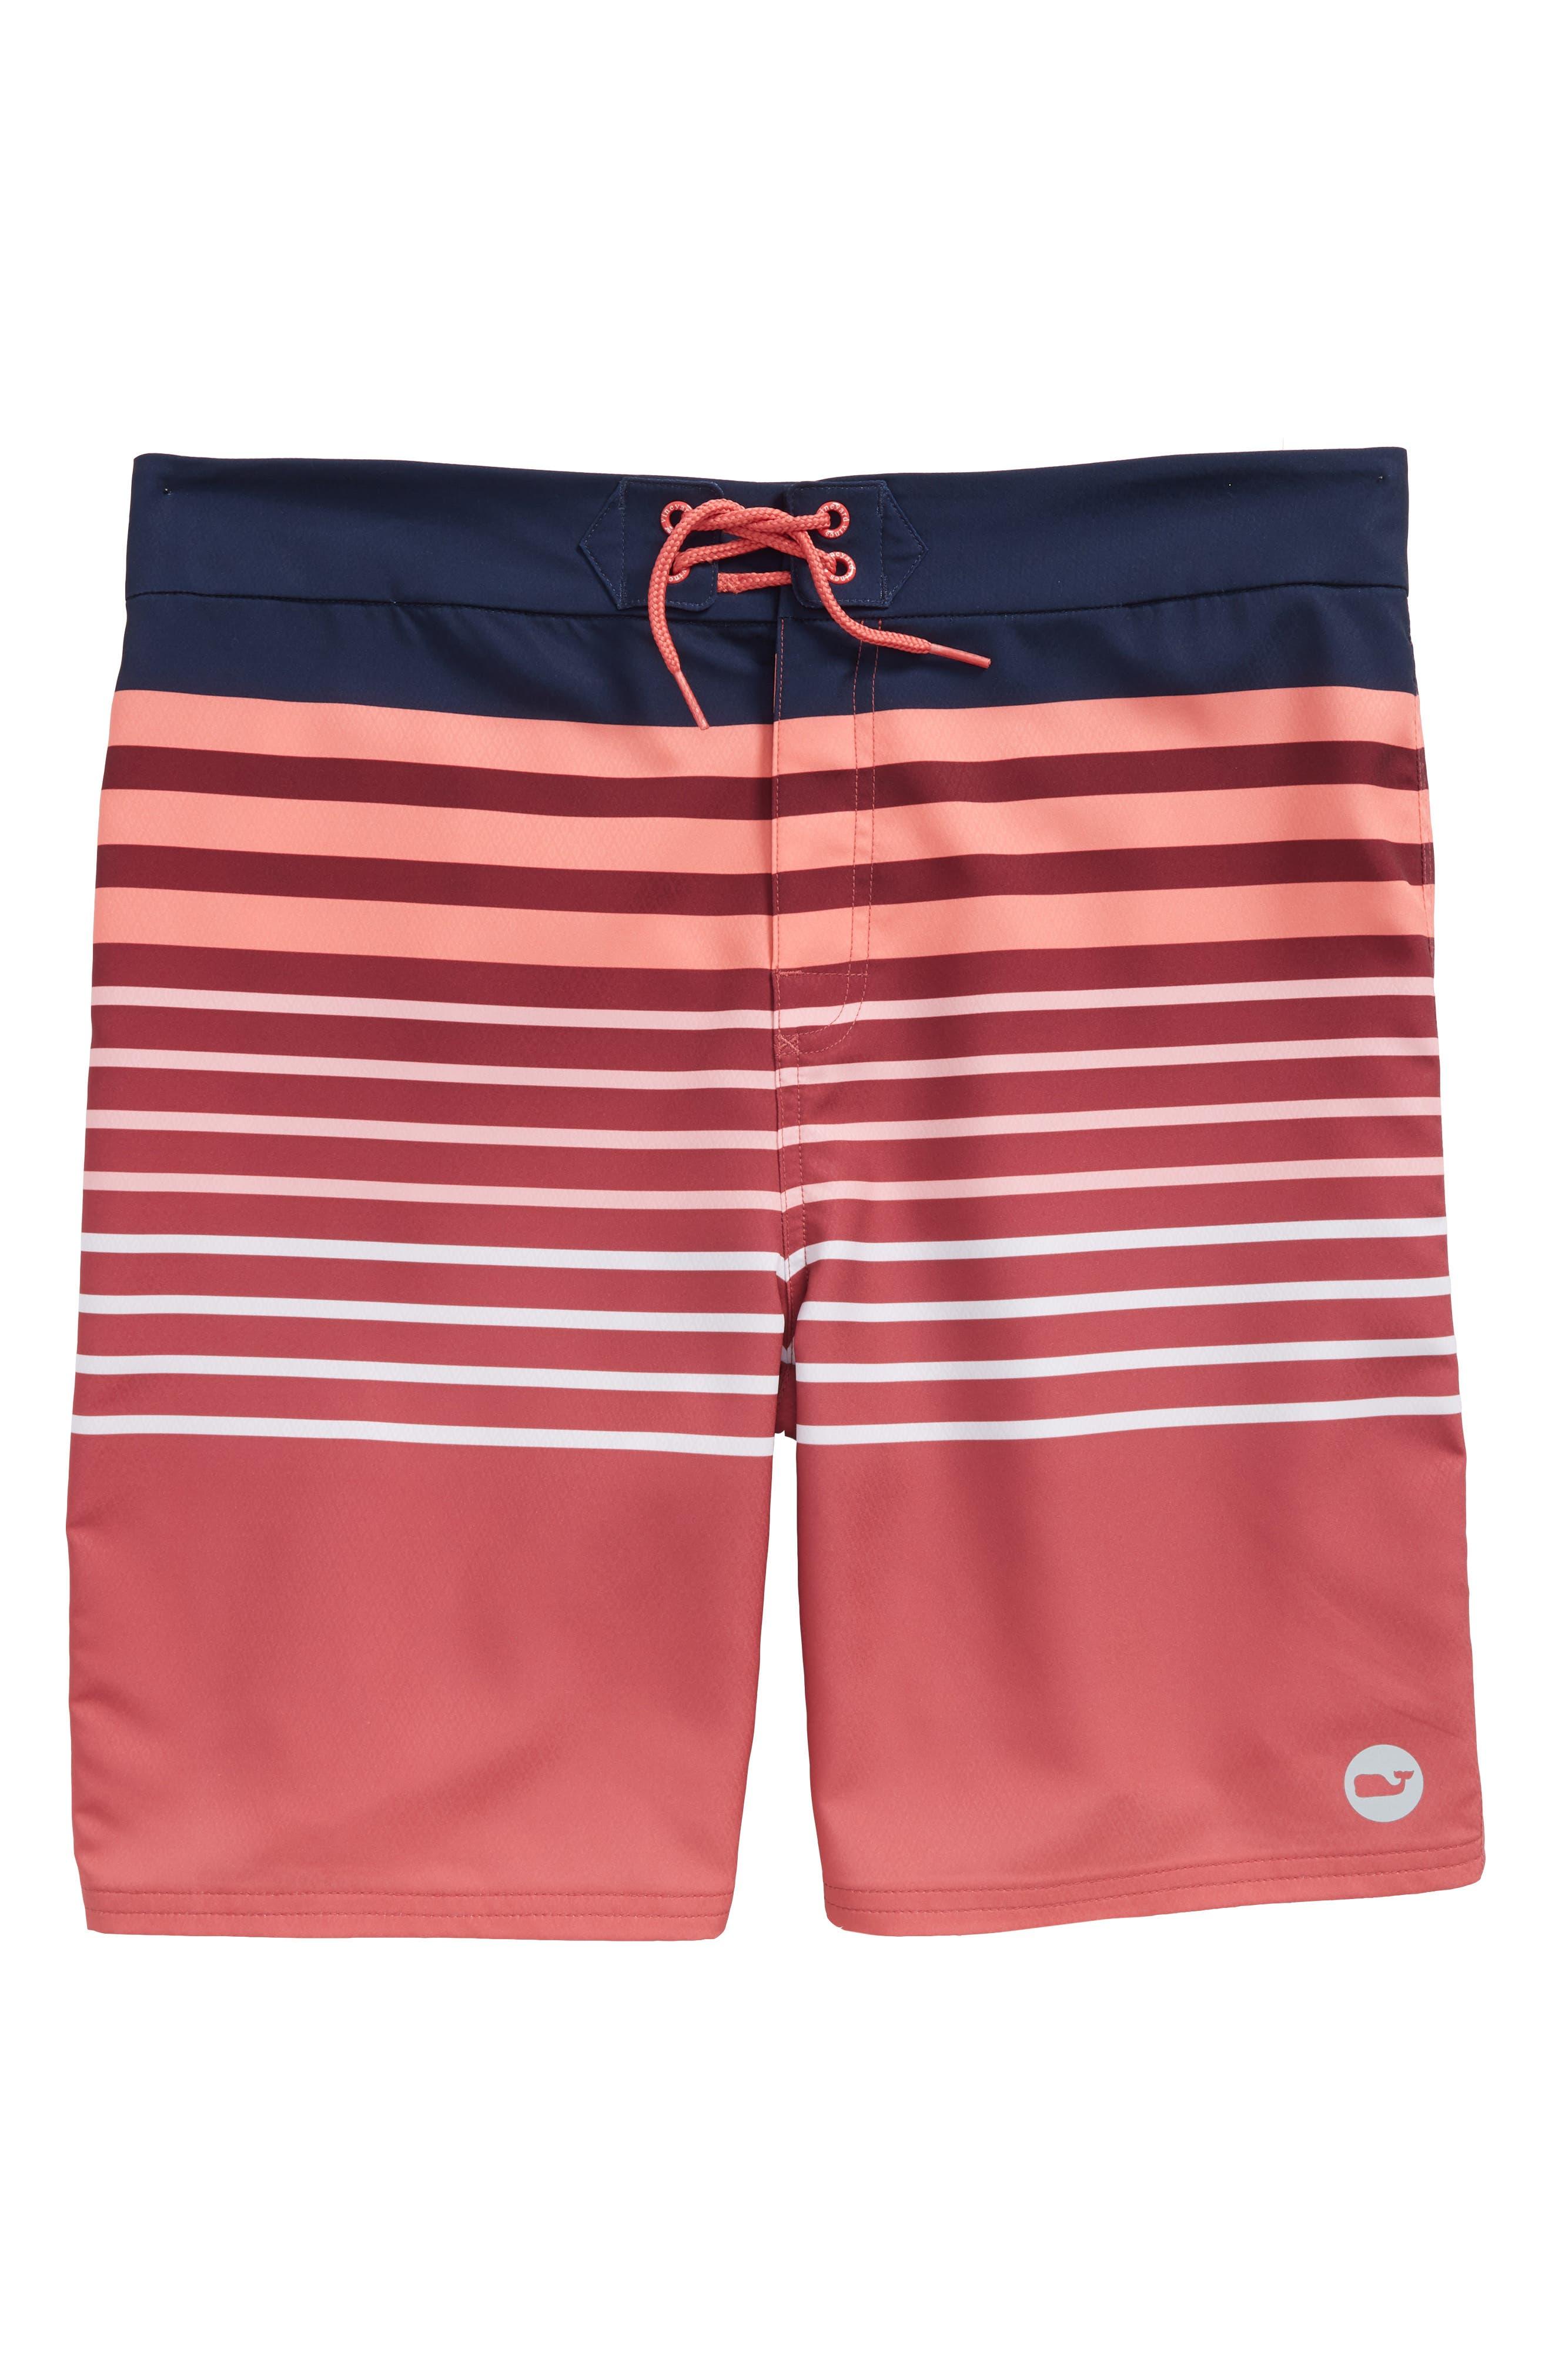 Surflodge Stripe Board Shorts,                         Main,                         color, 628